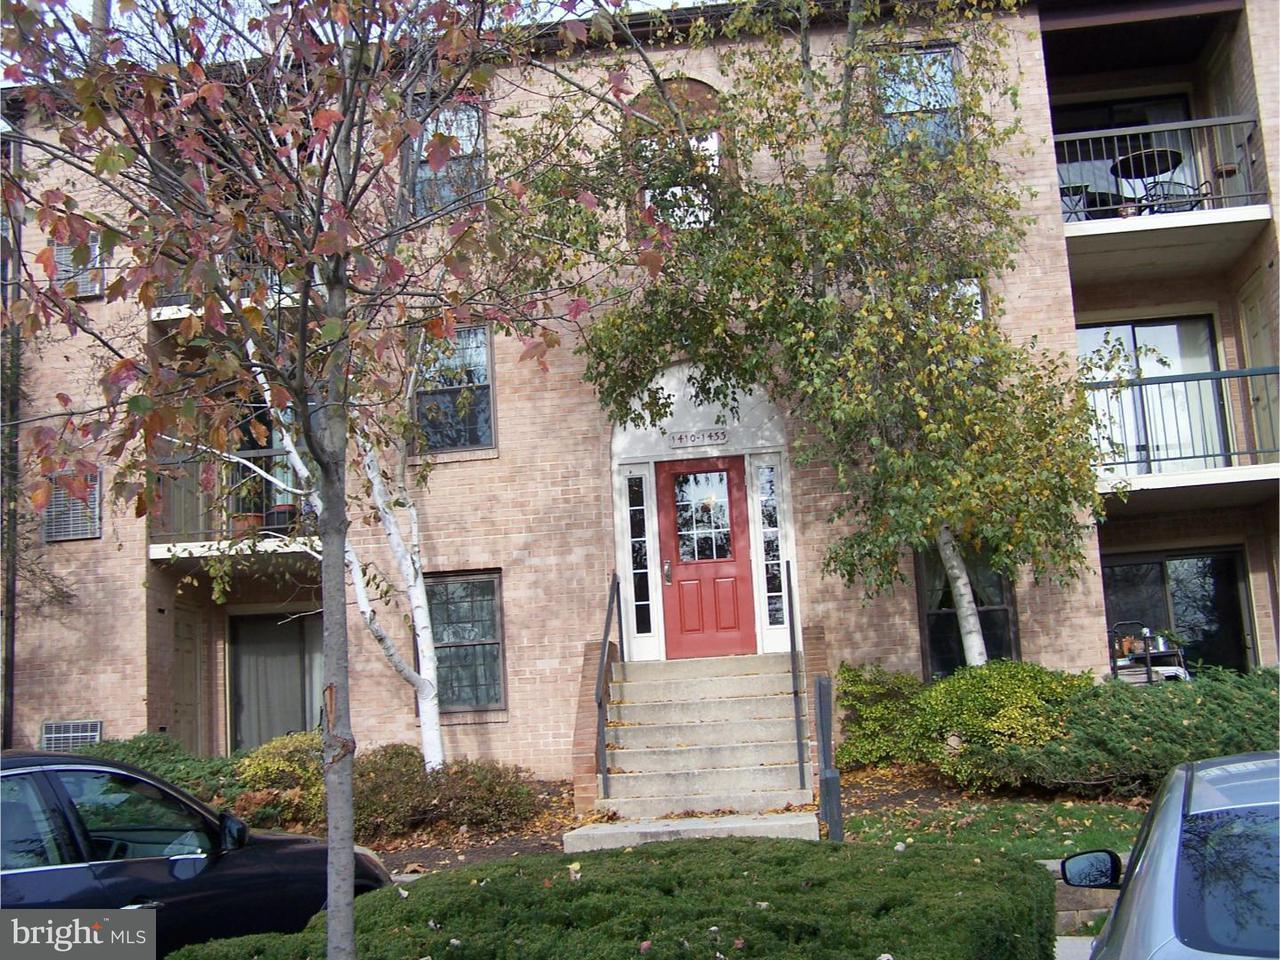 Single Family Home for Rent at 1423 WASHINGTON PL #23 Wayne, Pennsylvania 19087 United States